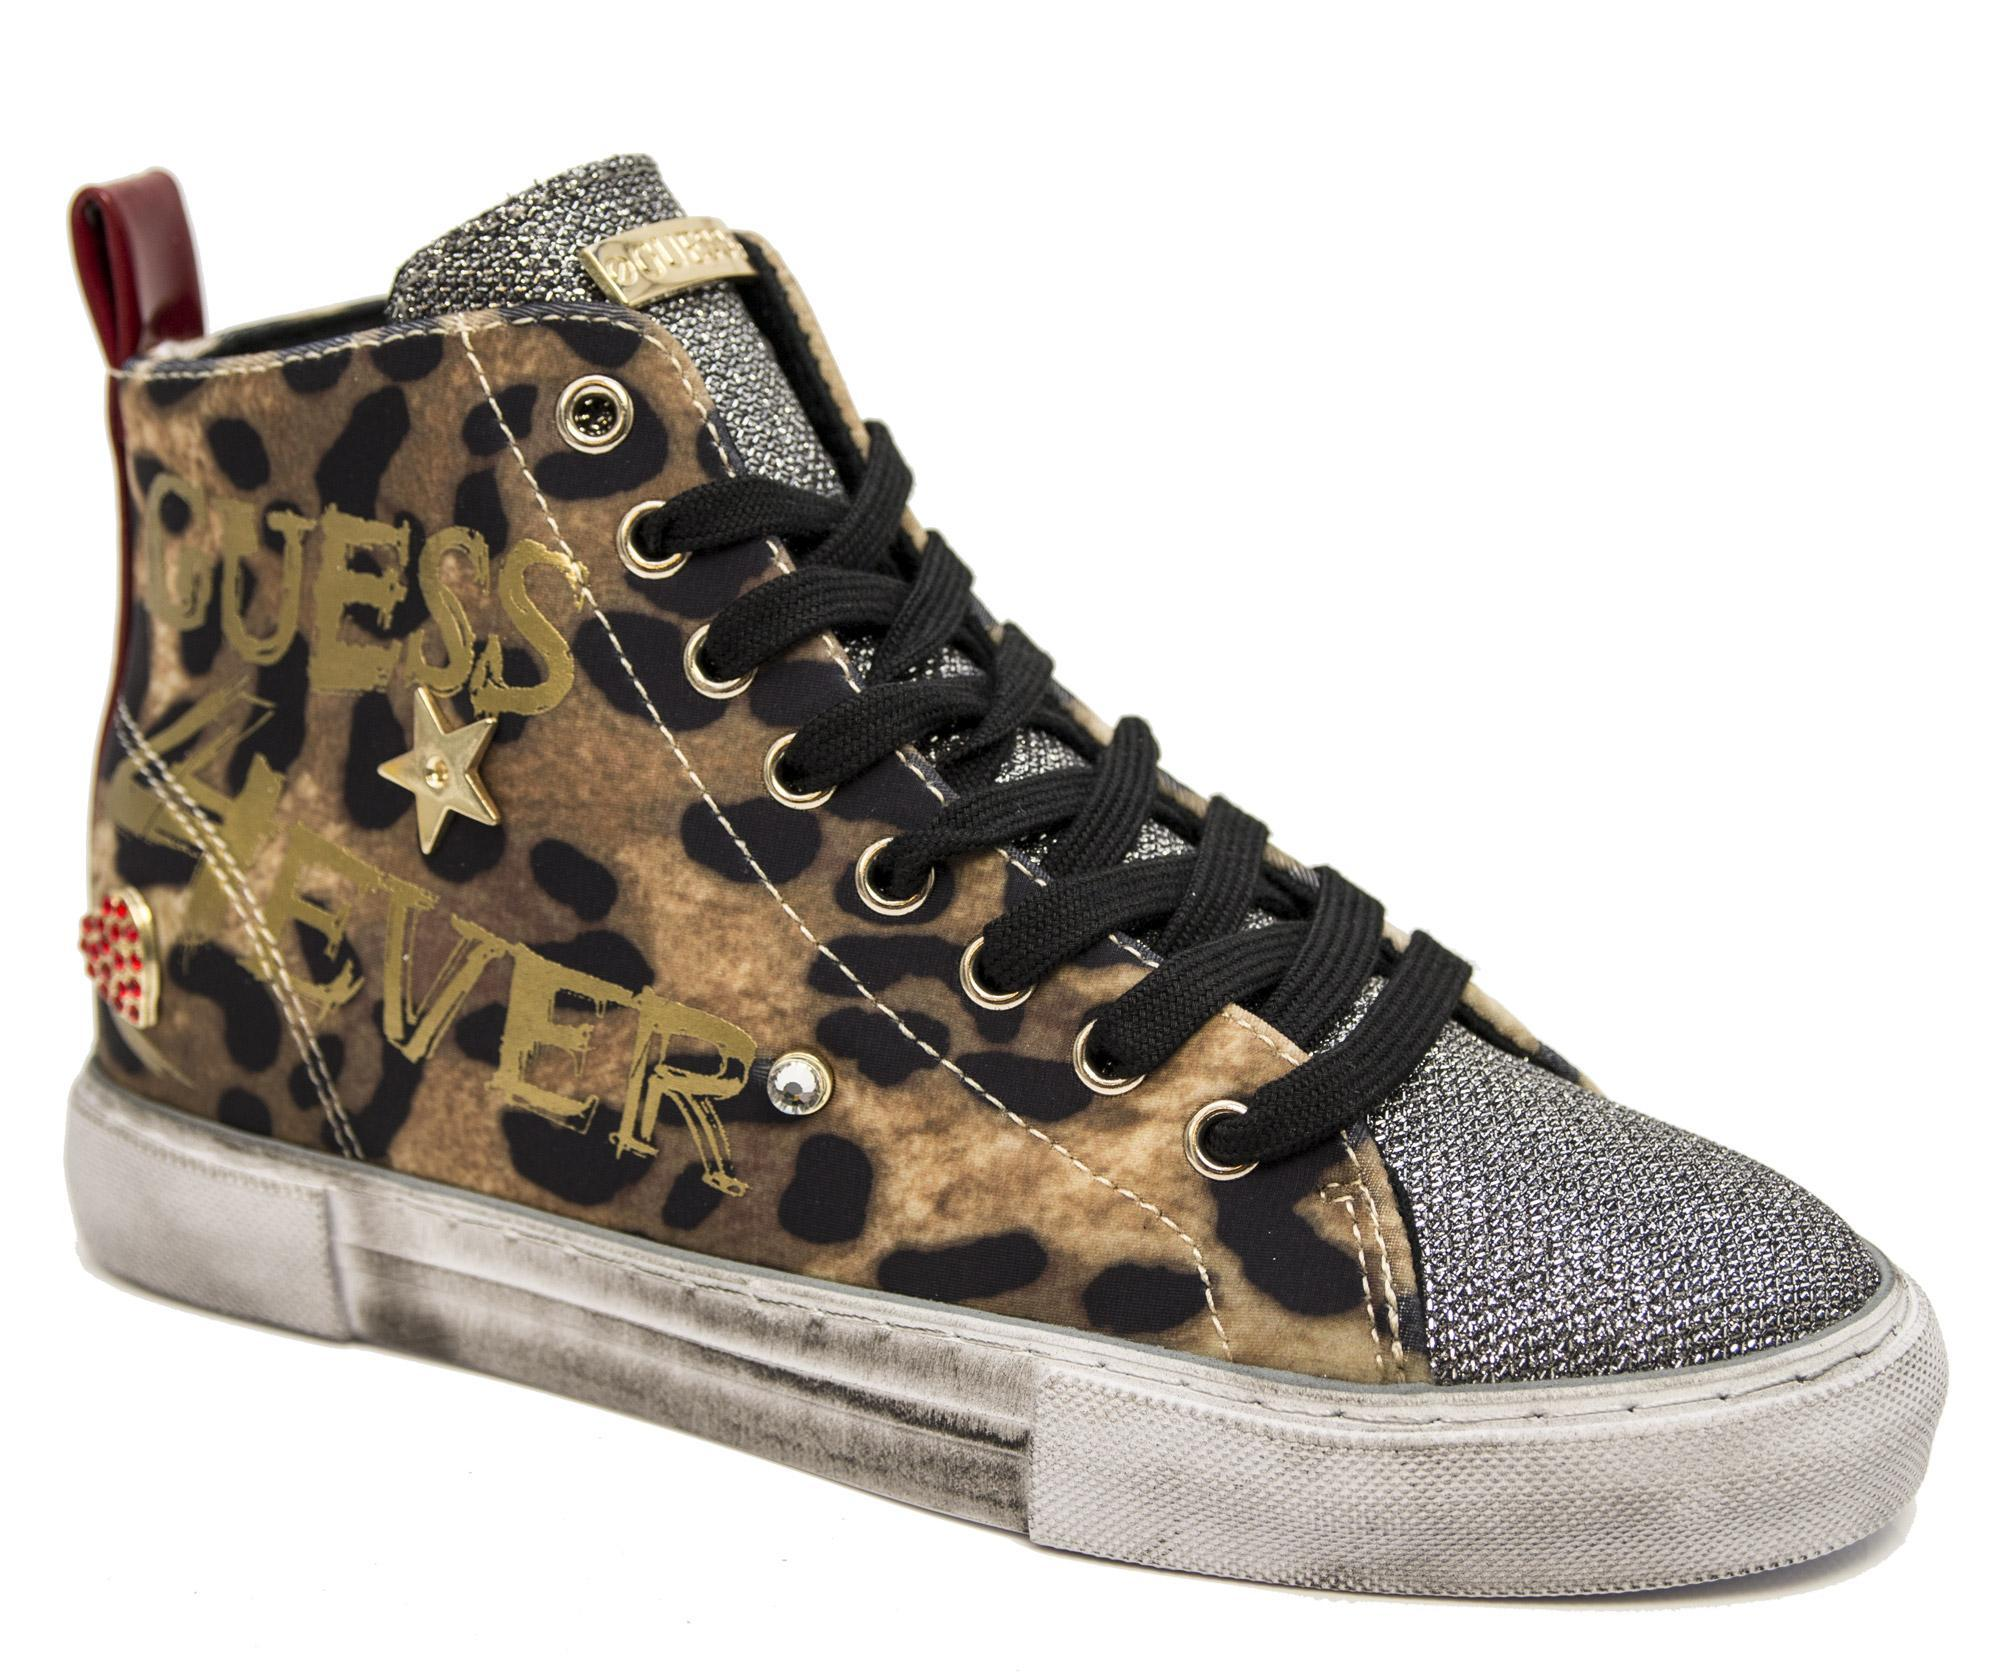 mid Guess FLPYE4-FAP12 donna scarpe donna FLPYE4-FAP12 maculate